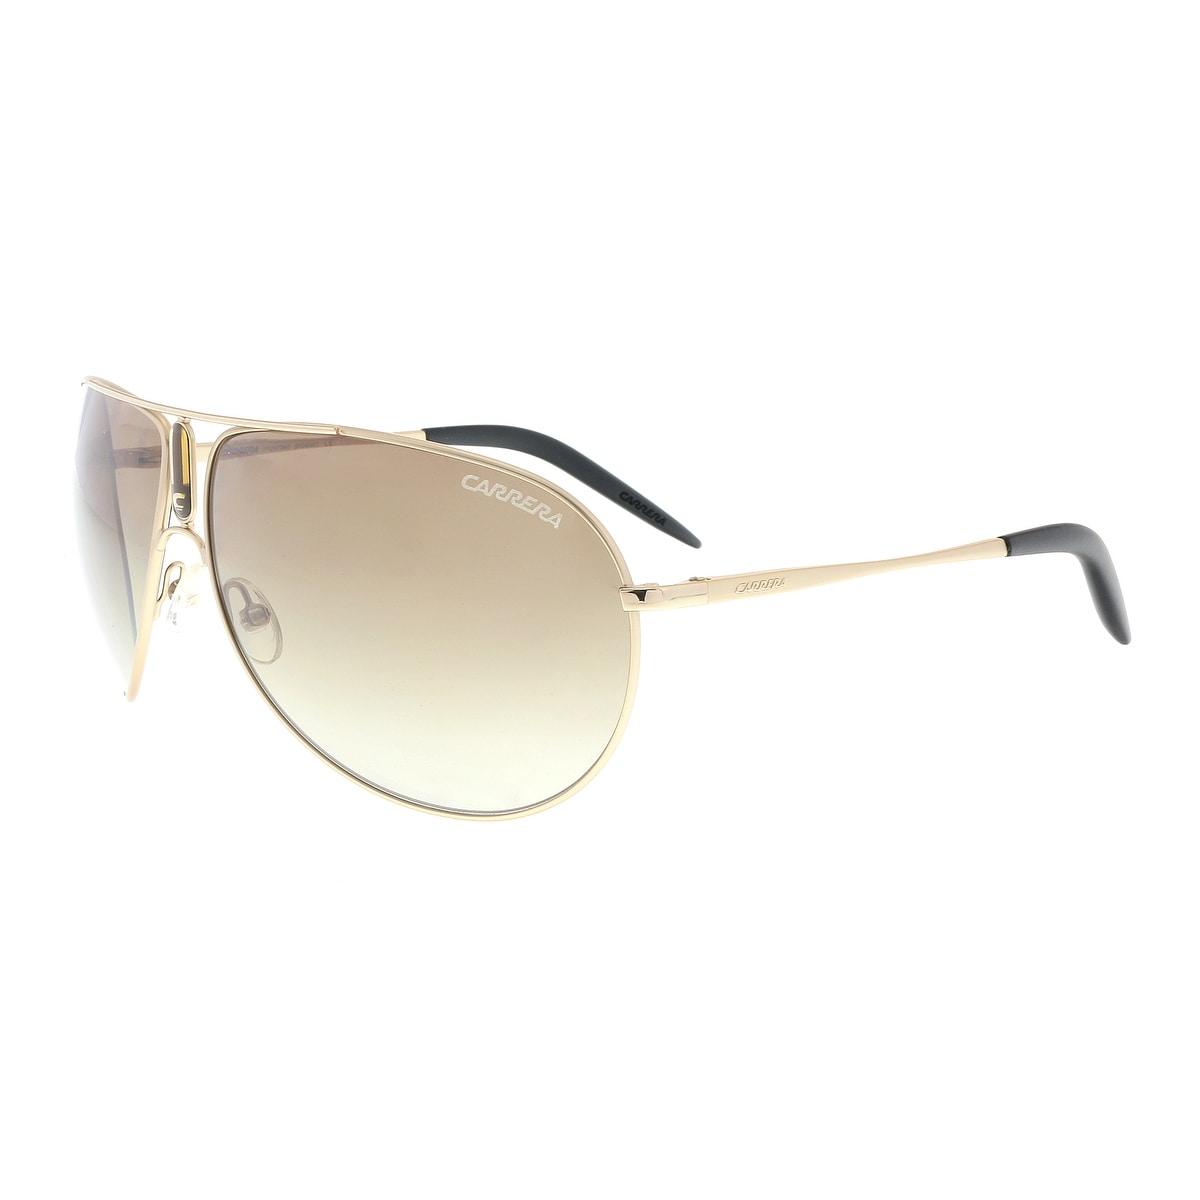 d695ca2d98 Aviator Men s Sunglasses